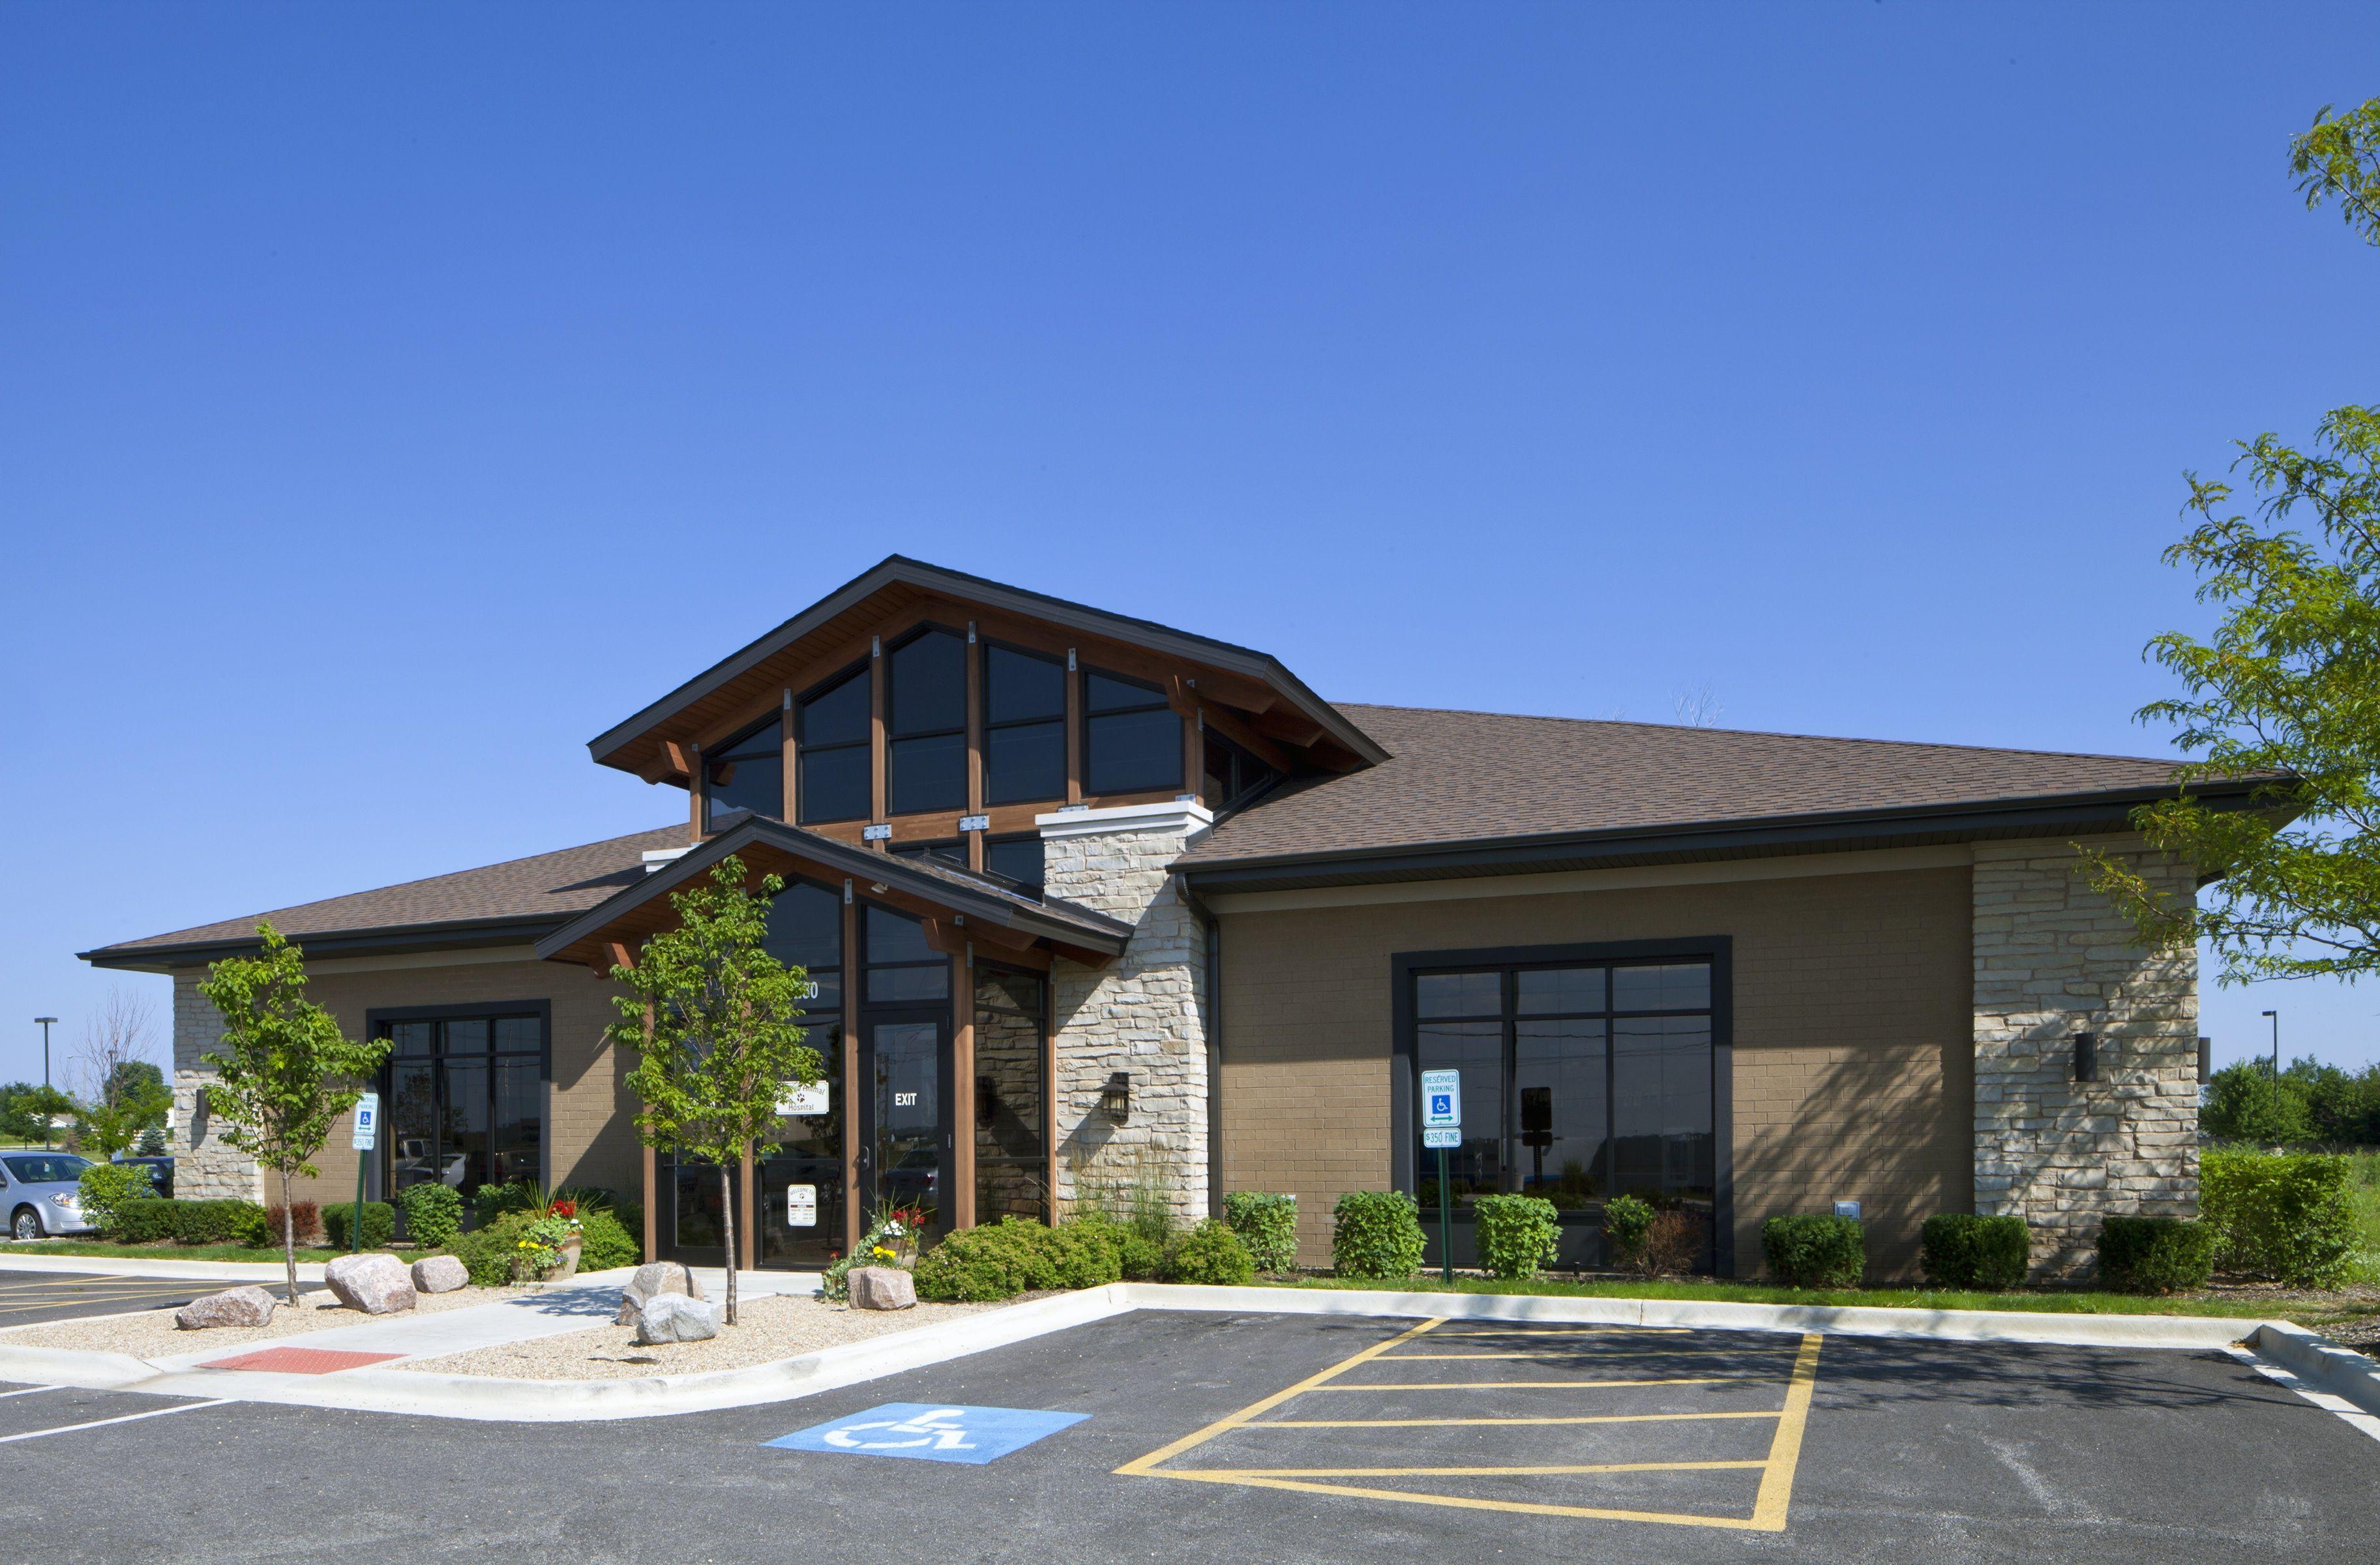 Oswego Animal Hospital Oswego Il Hospital Design Building Design Plan Veterinary